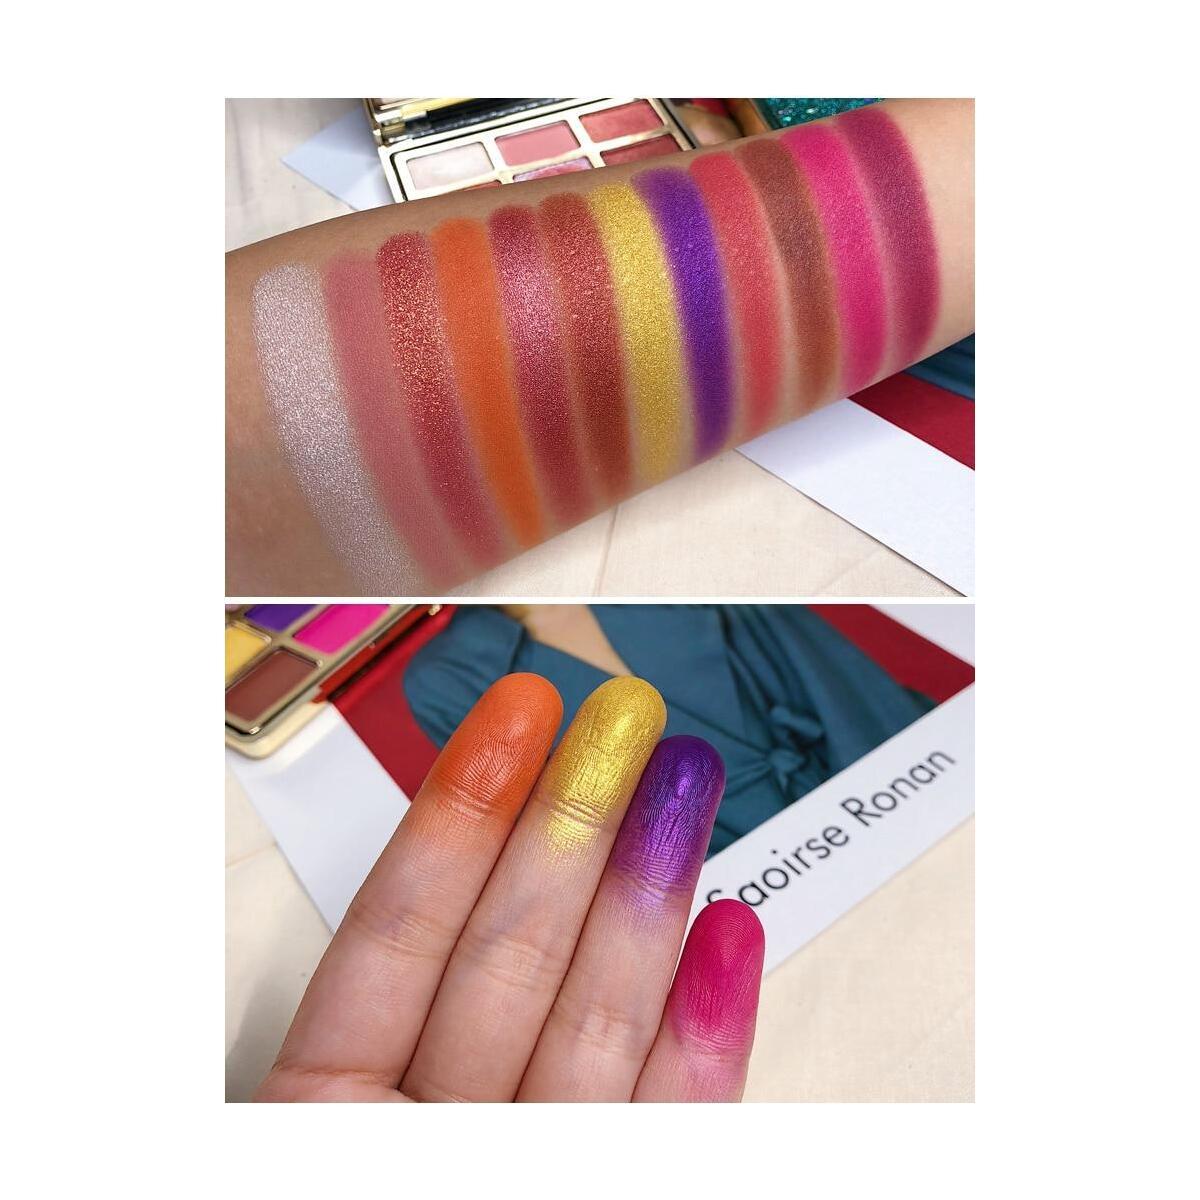 RomanticBird Febble Eyeshadow Diamond Glitter Metallic 12 Color Eyeshadow Palette, 03 / China